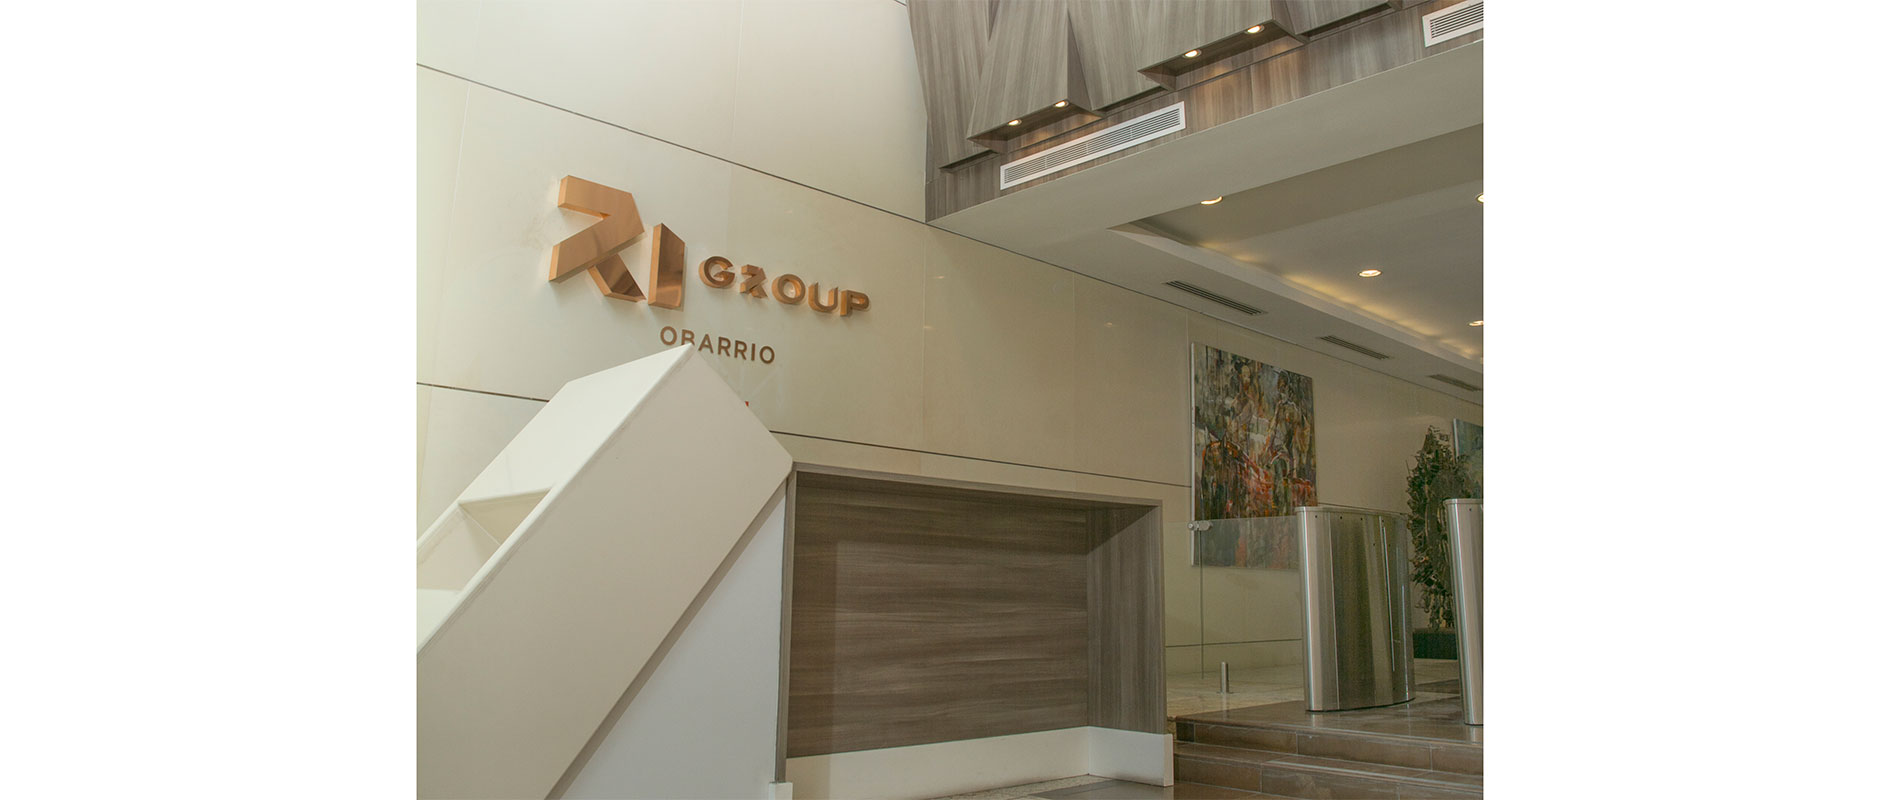 RI Group